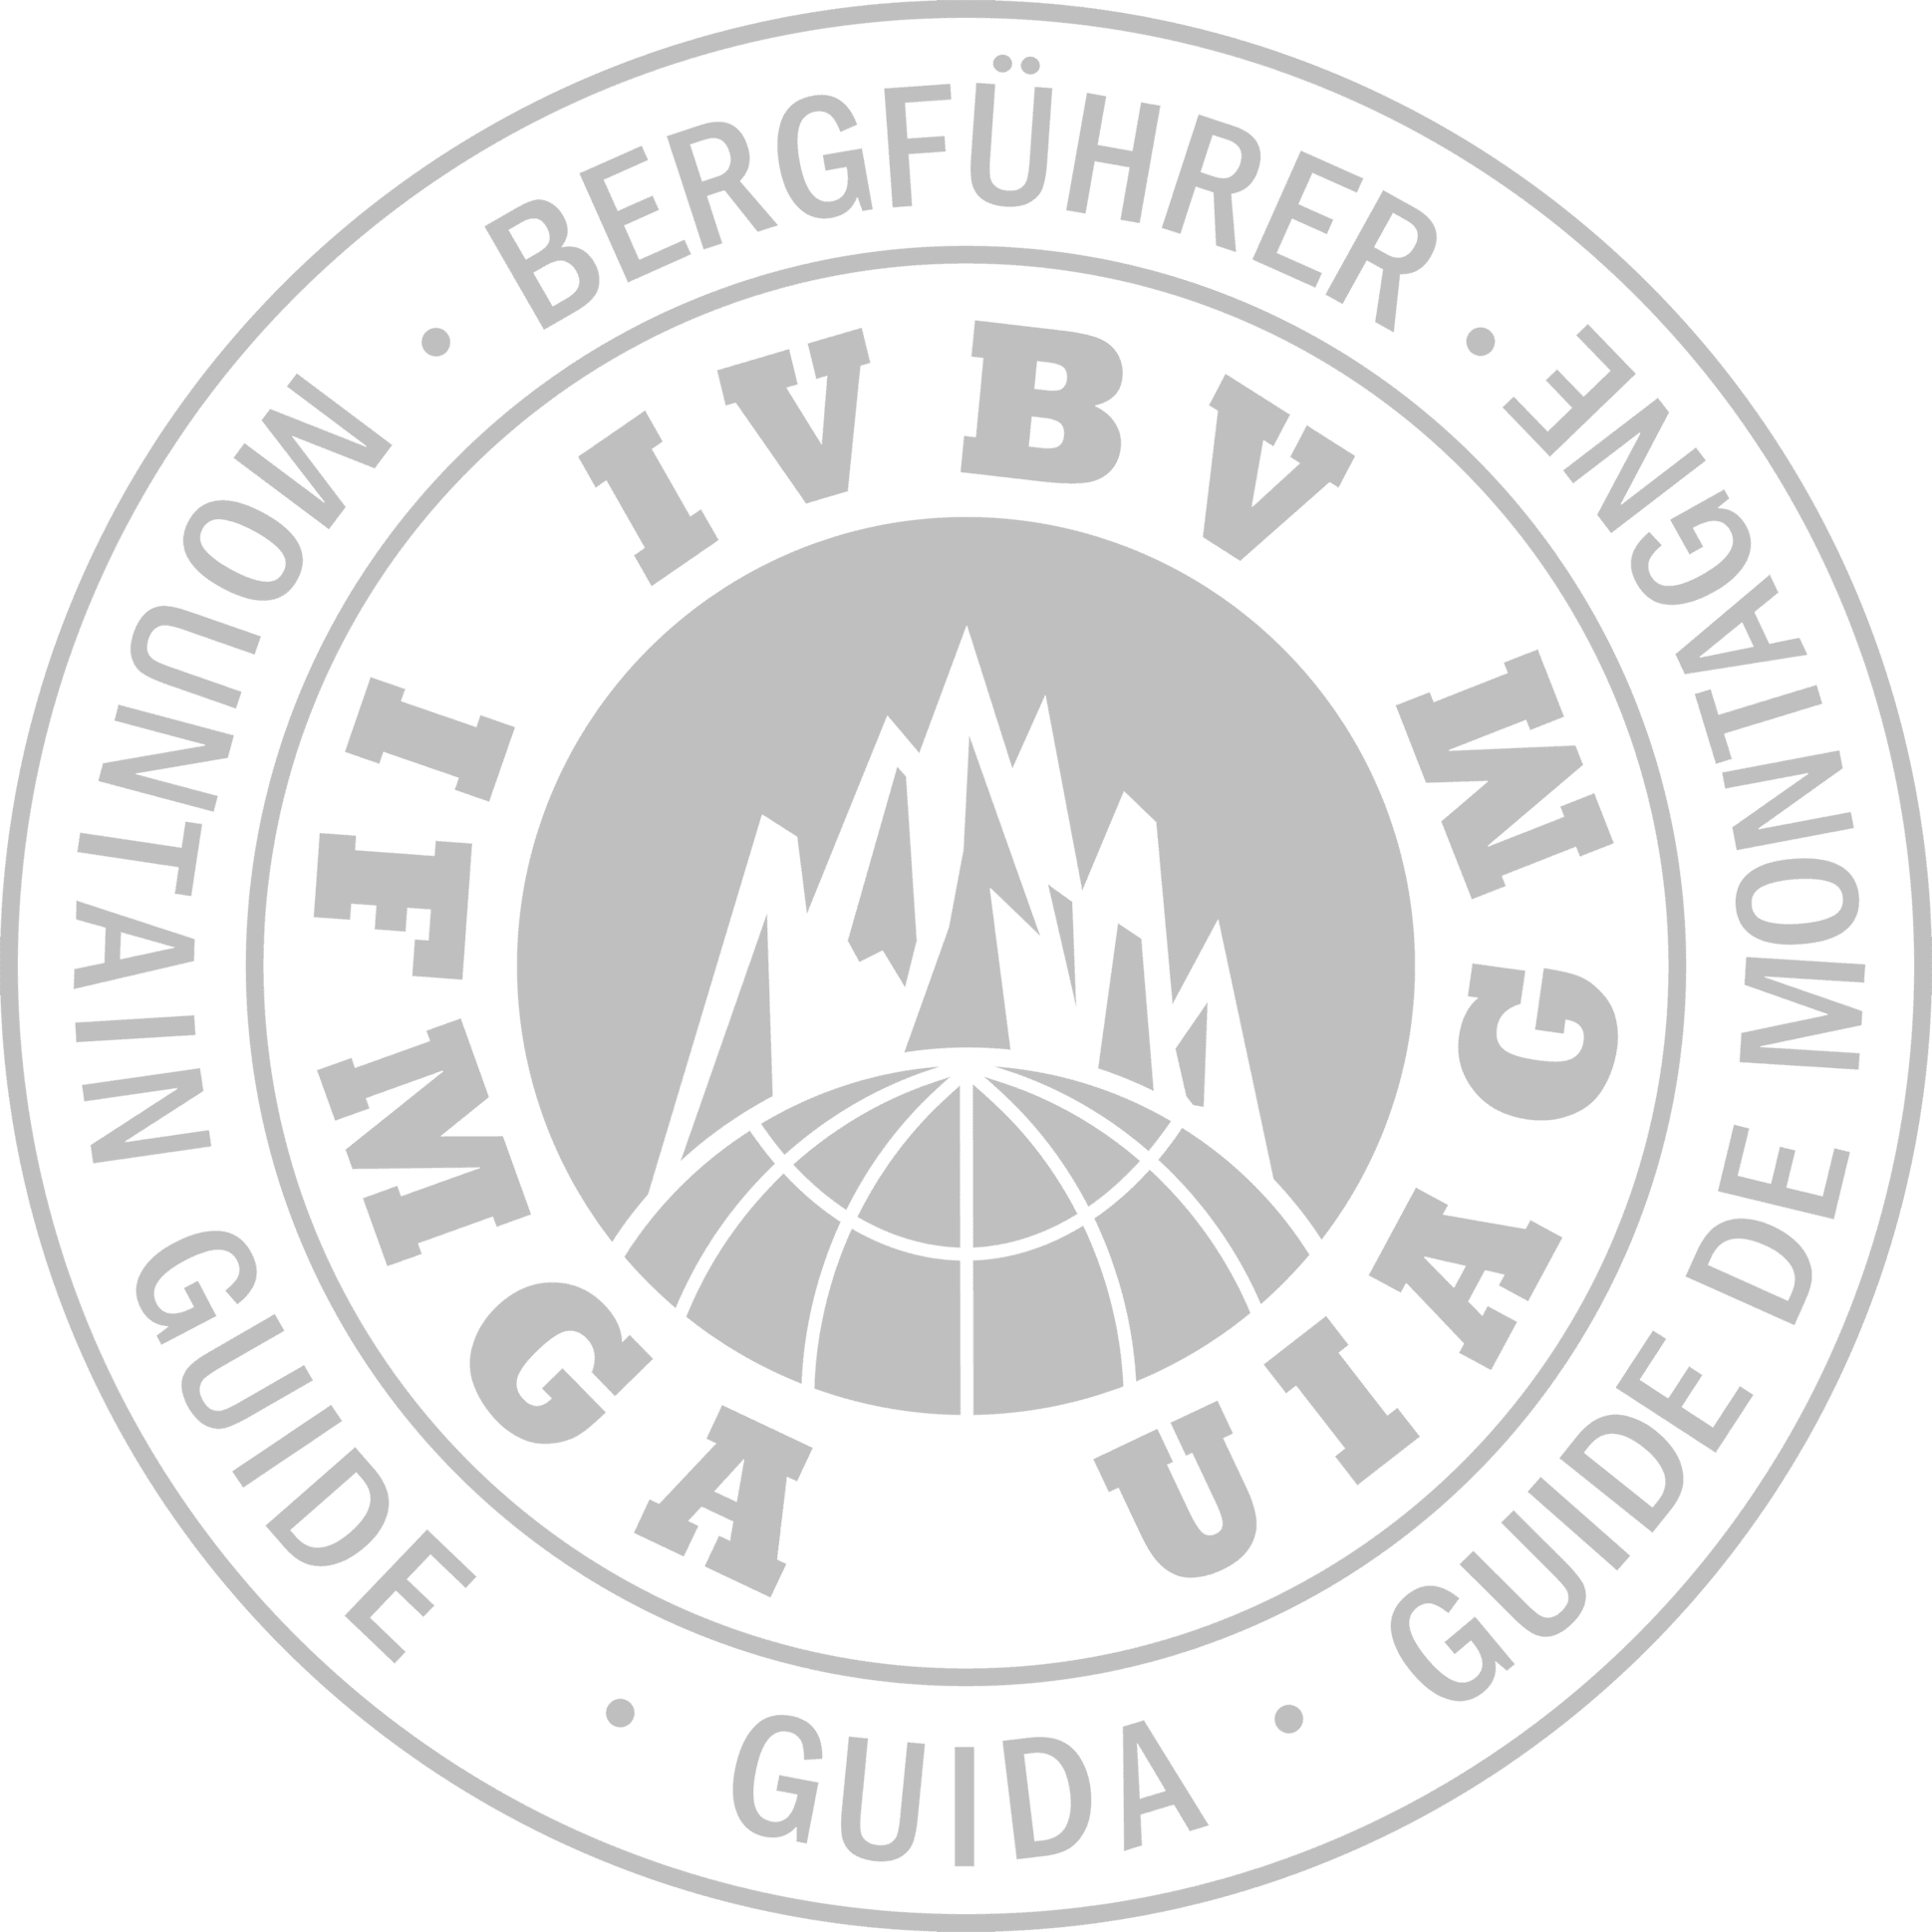 IVBV Bergführer